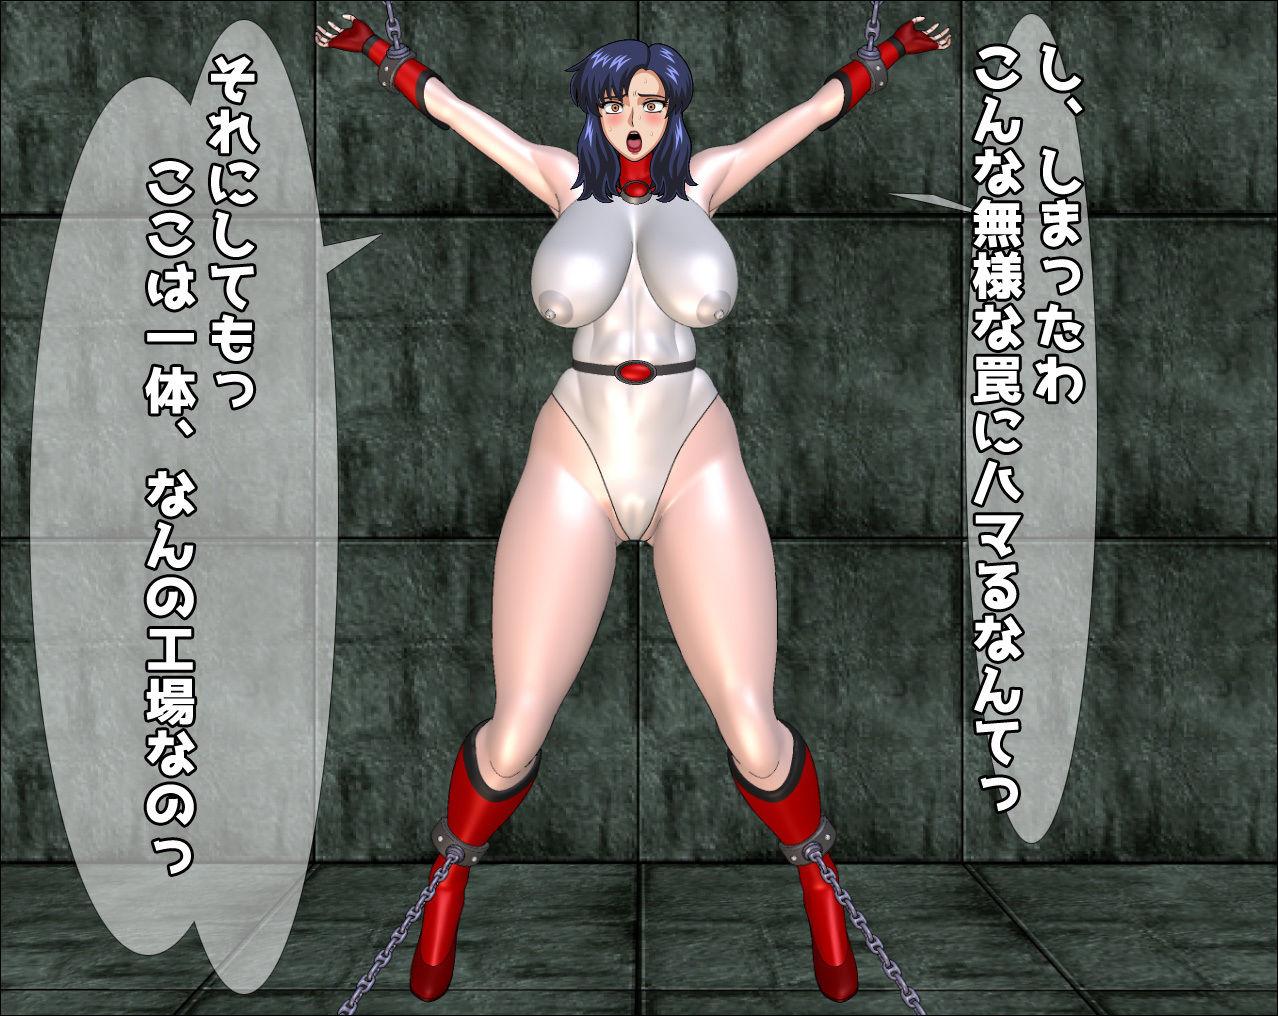 機械姦〜巨乳女性ヒーローと陵辱工場!